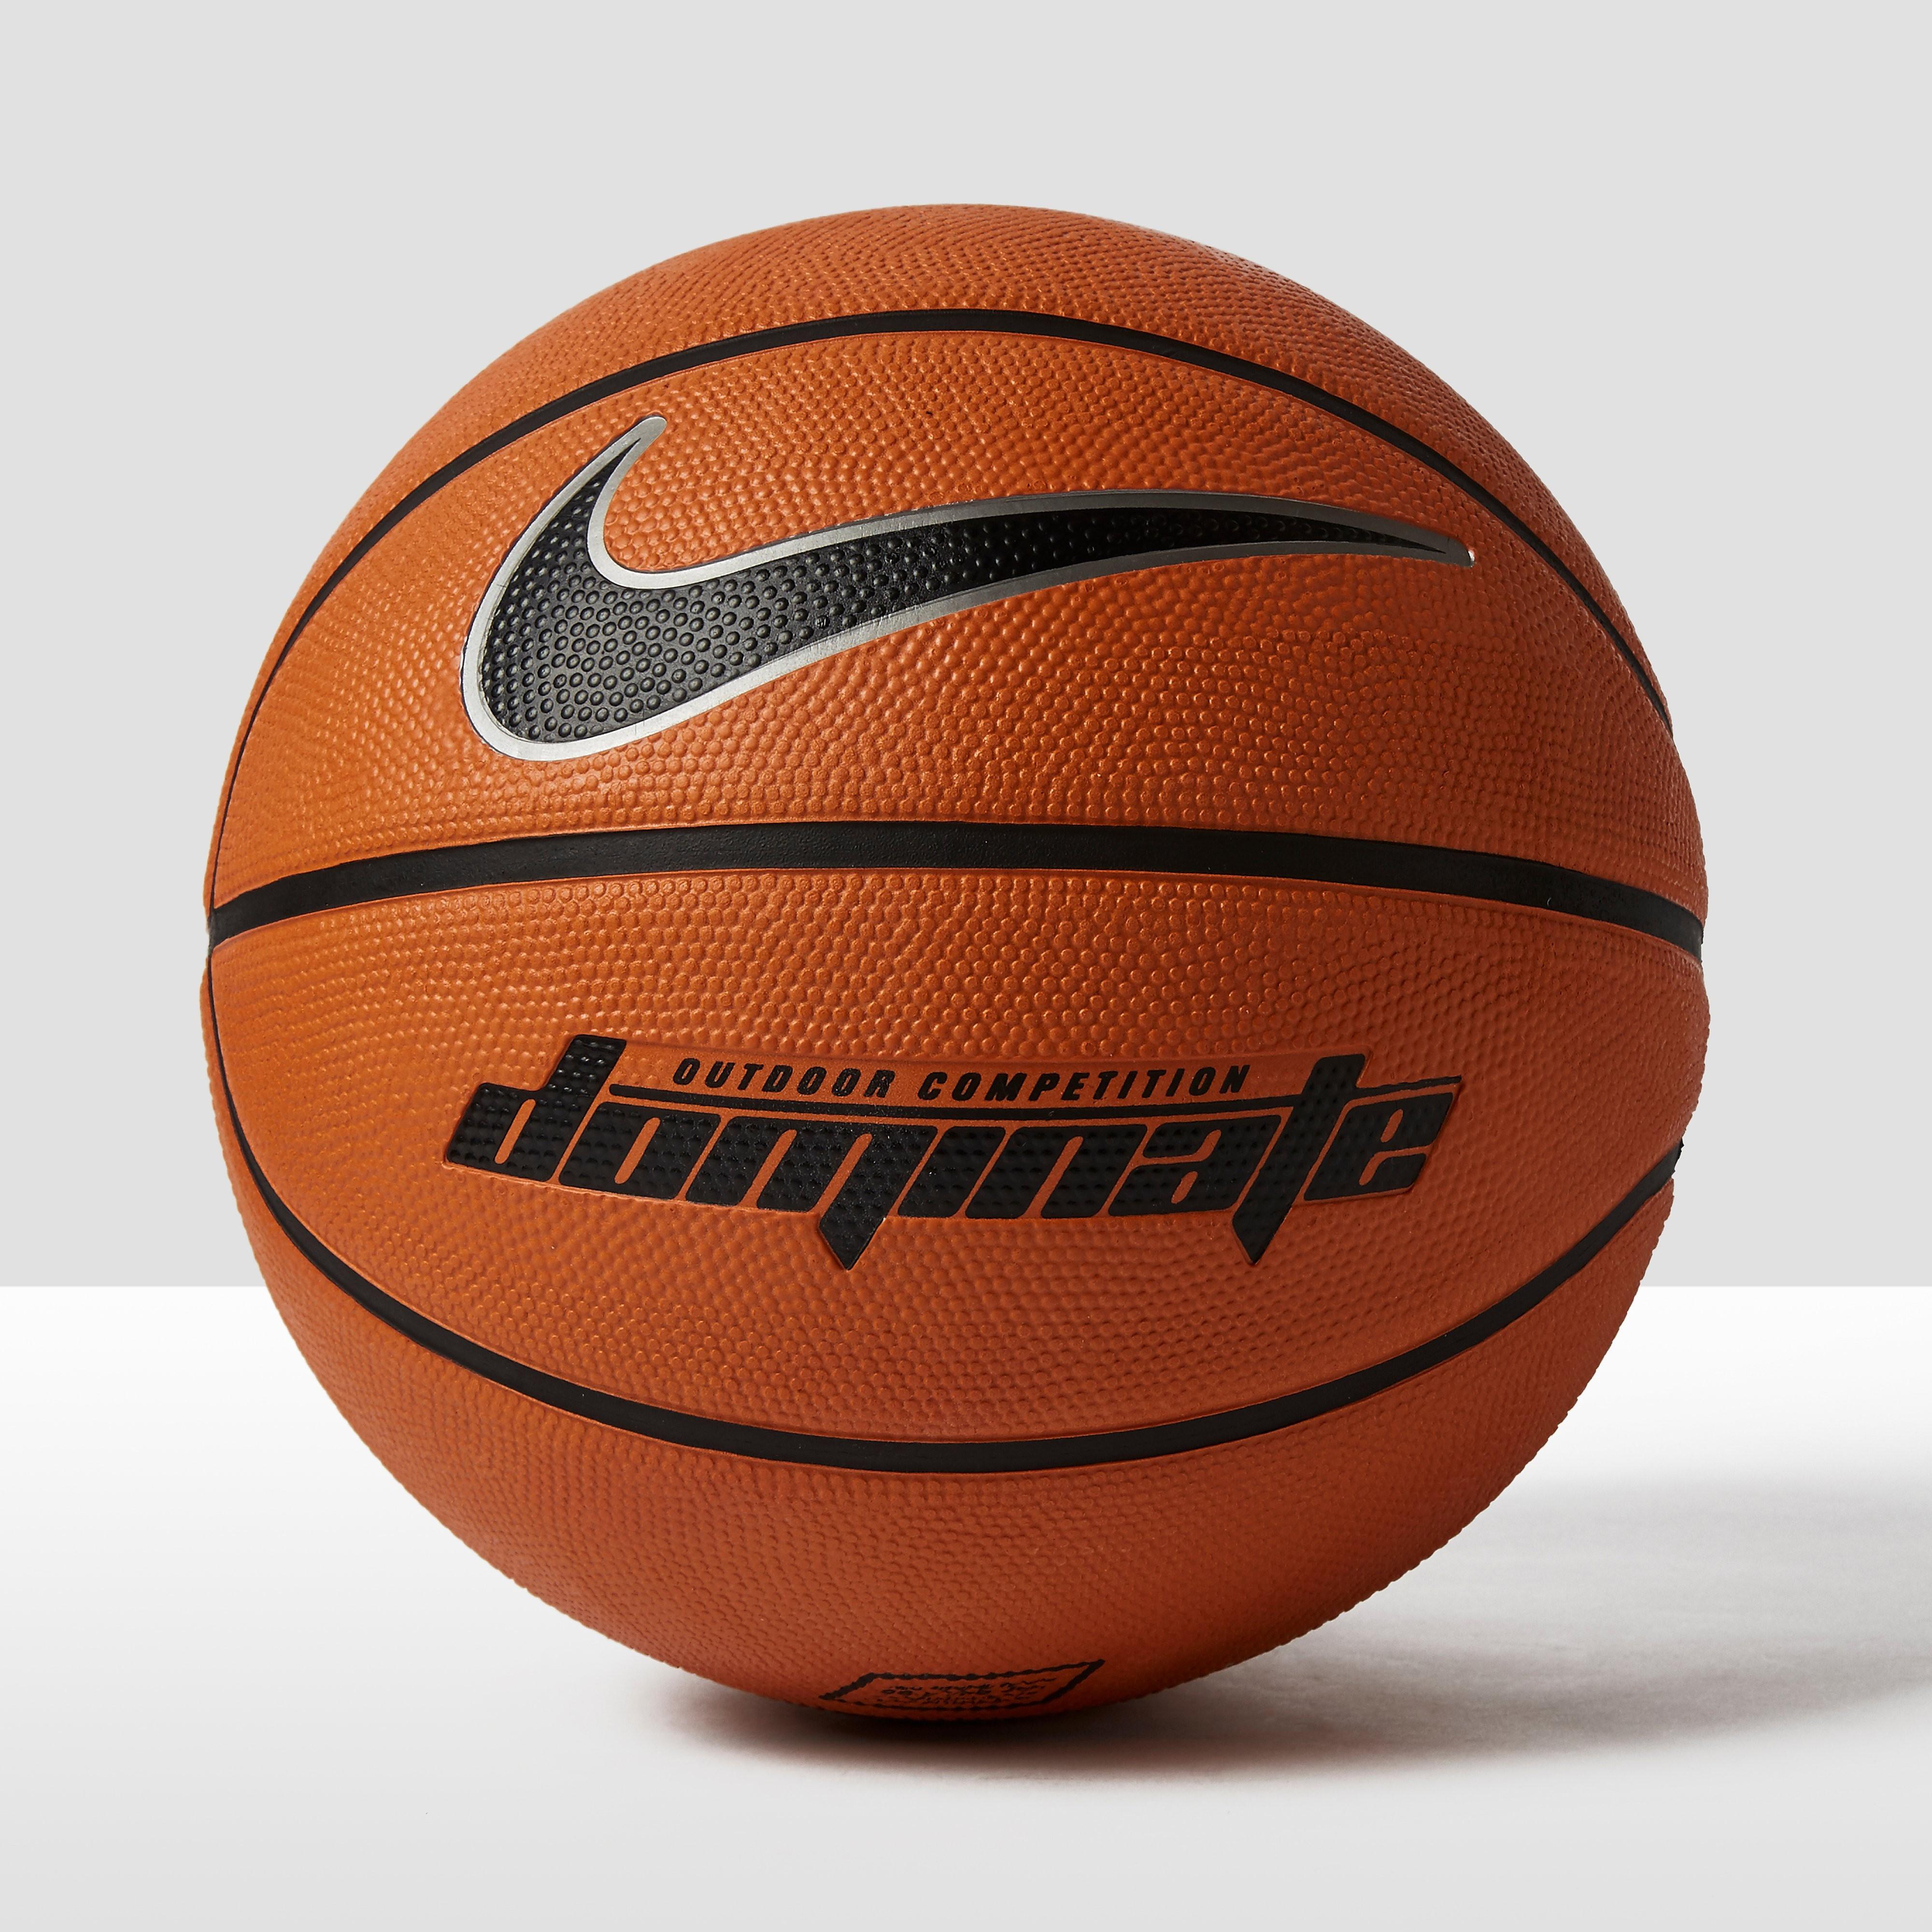 Nike Dominate Basketball (Size 6)